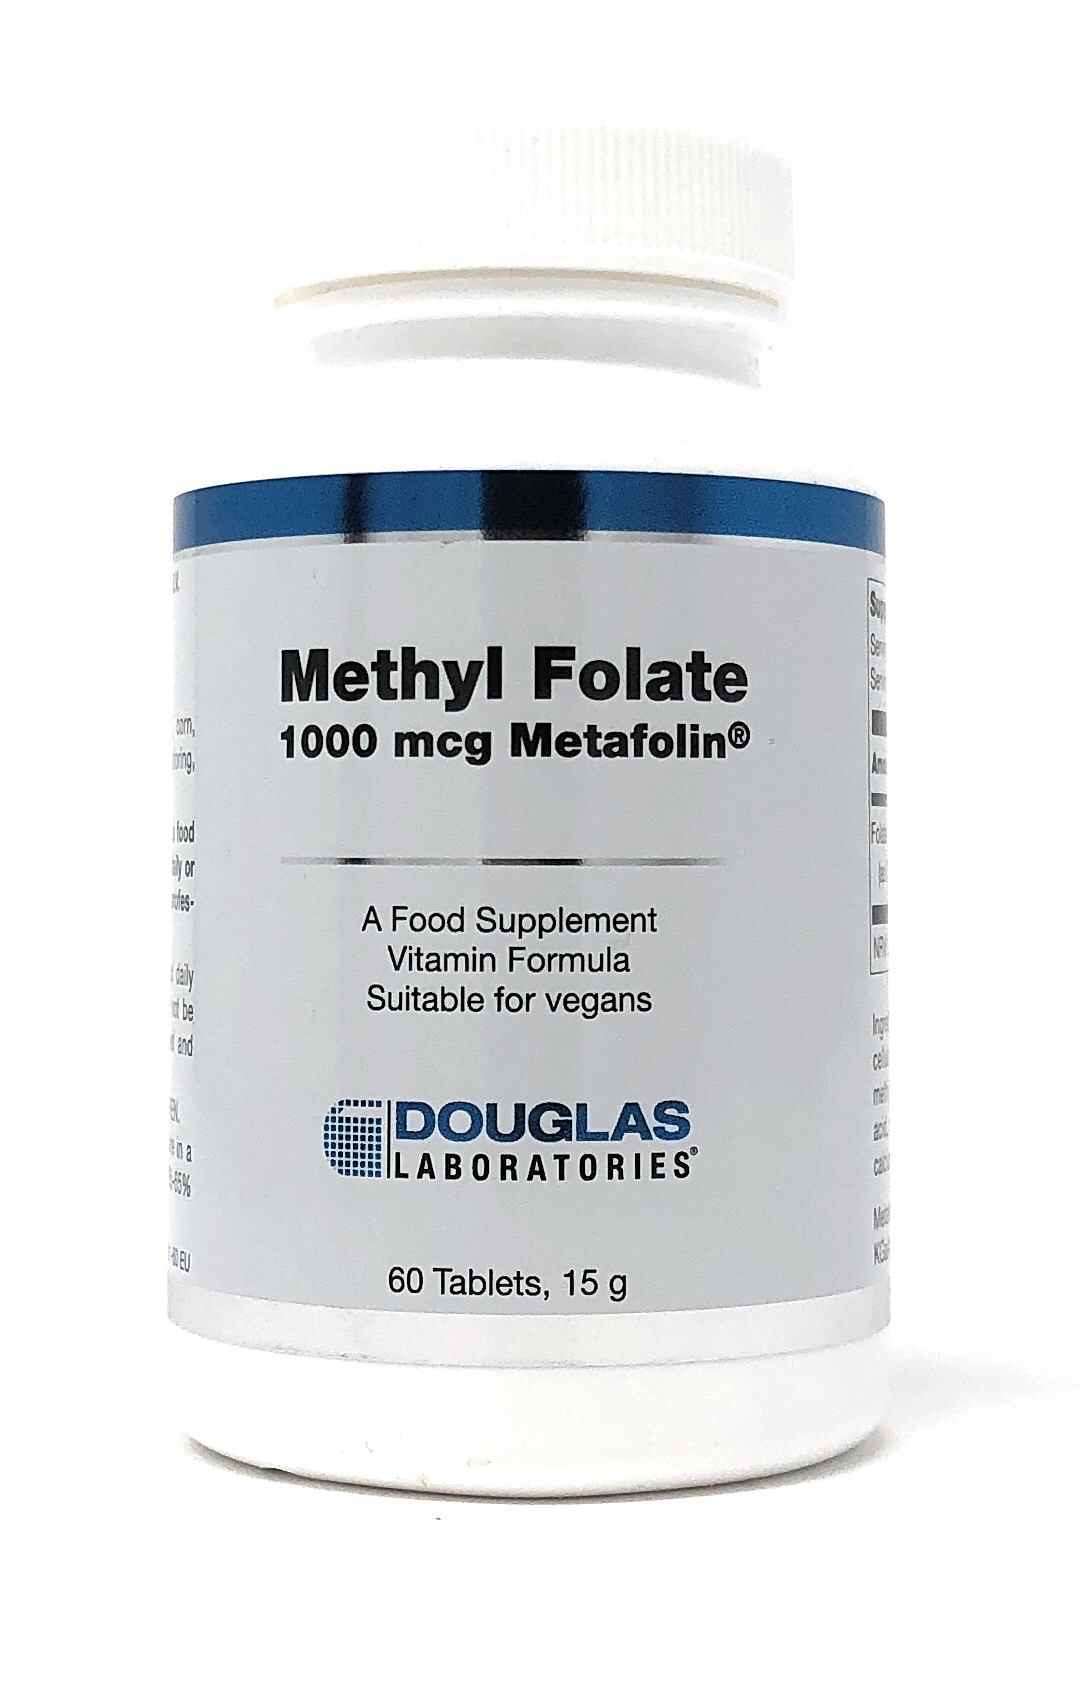 Douglas Laboratories Europe Methyl Folate (1000mcg Metafolin) 60 Tabletten (15g)(vegan)